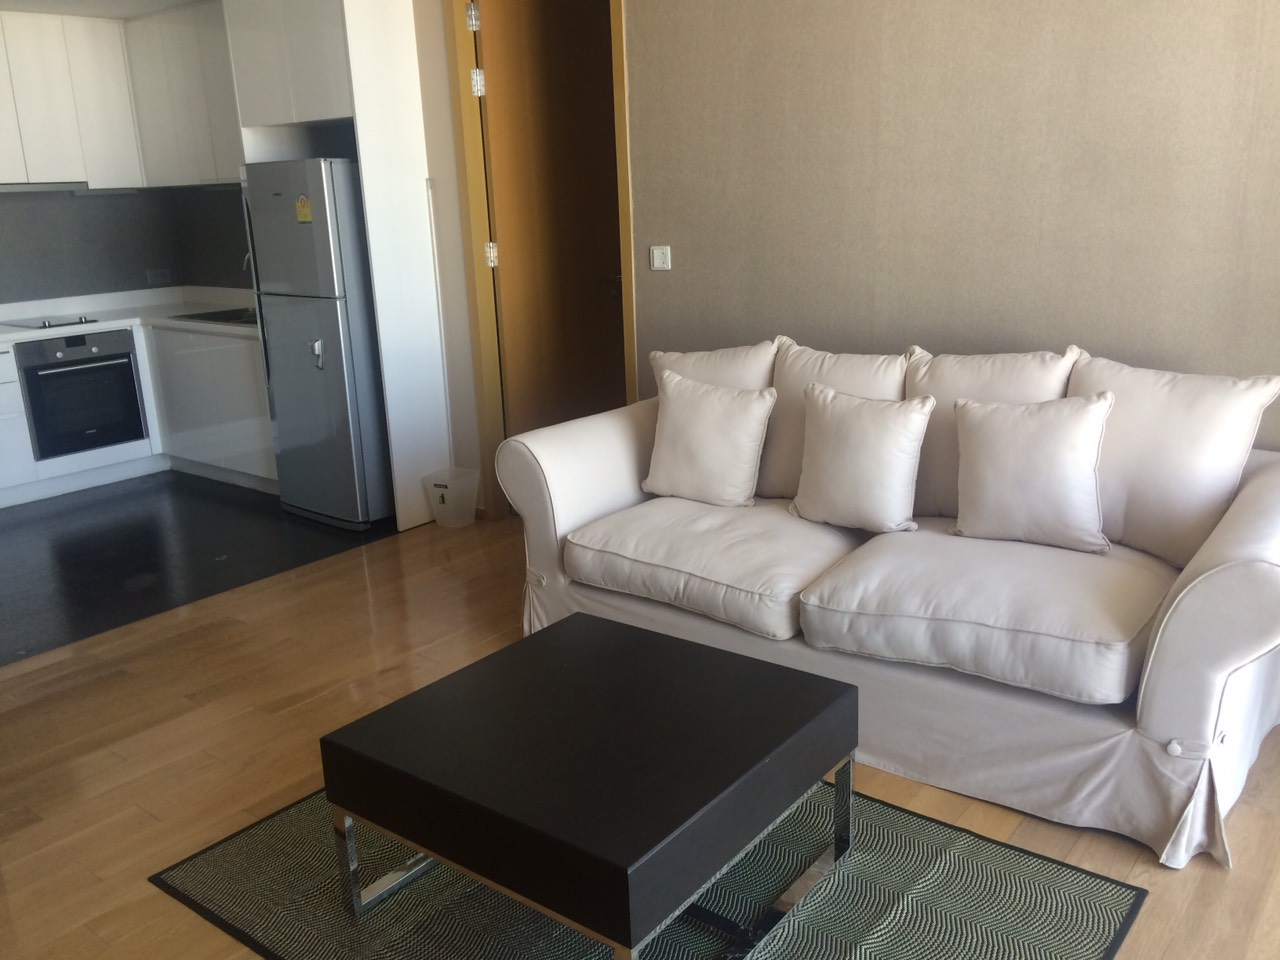 RE/MAX Properties Agency's SALE 1 Bedroom 61 Sq.m at Aequa 10